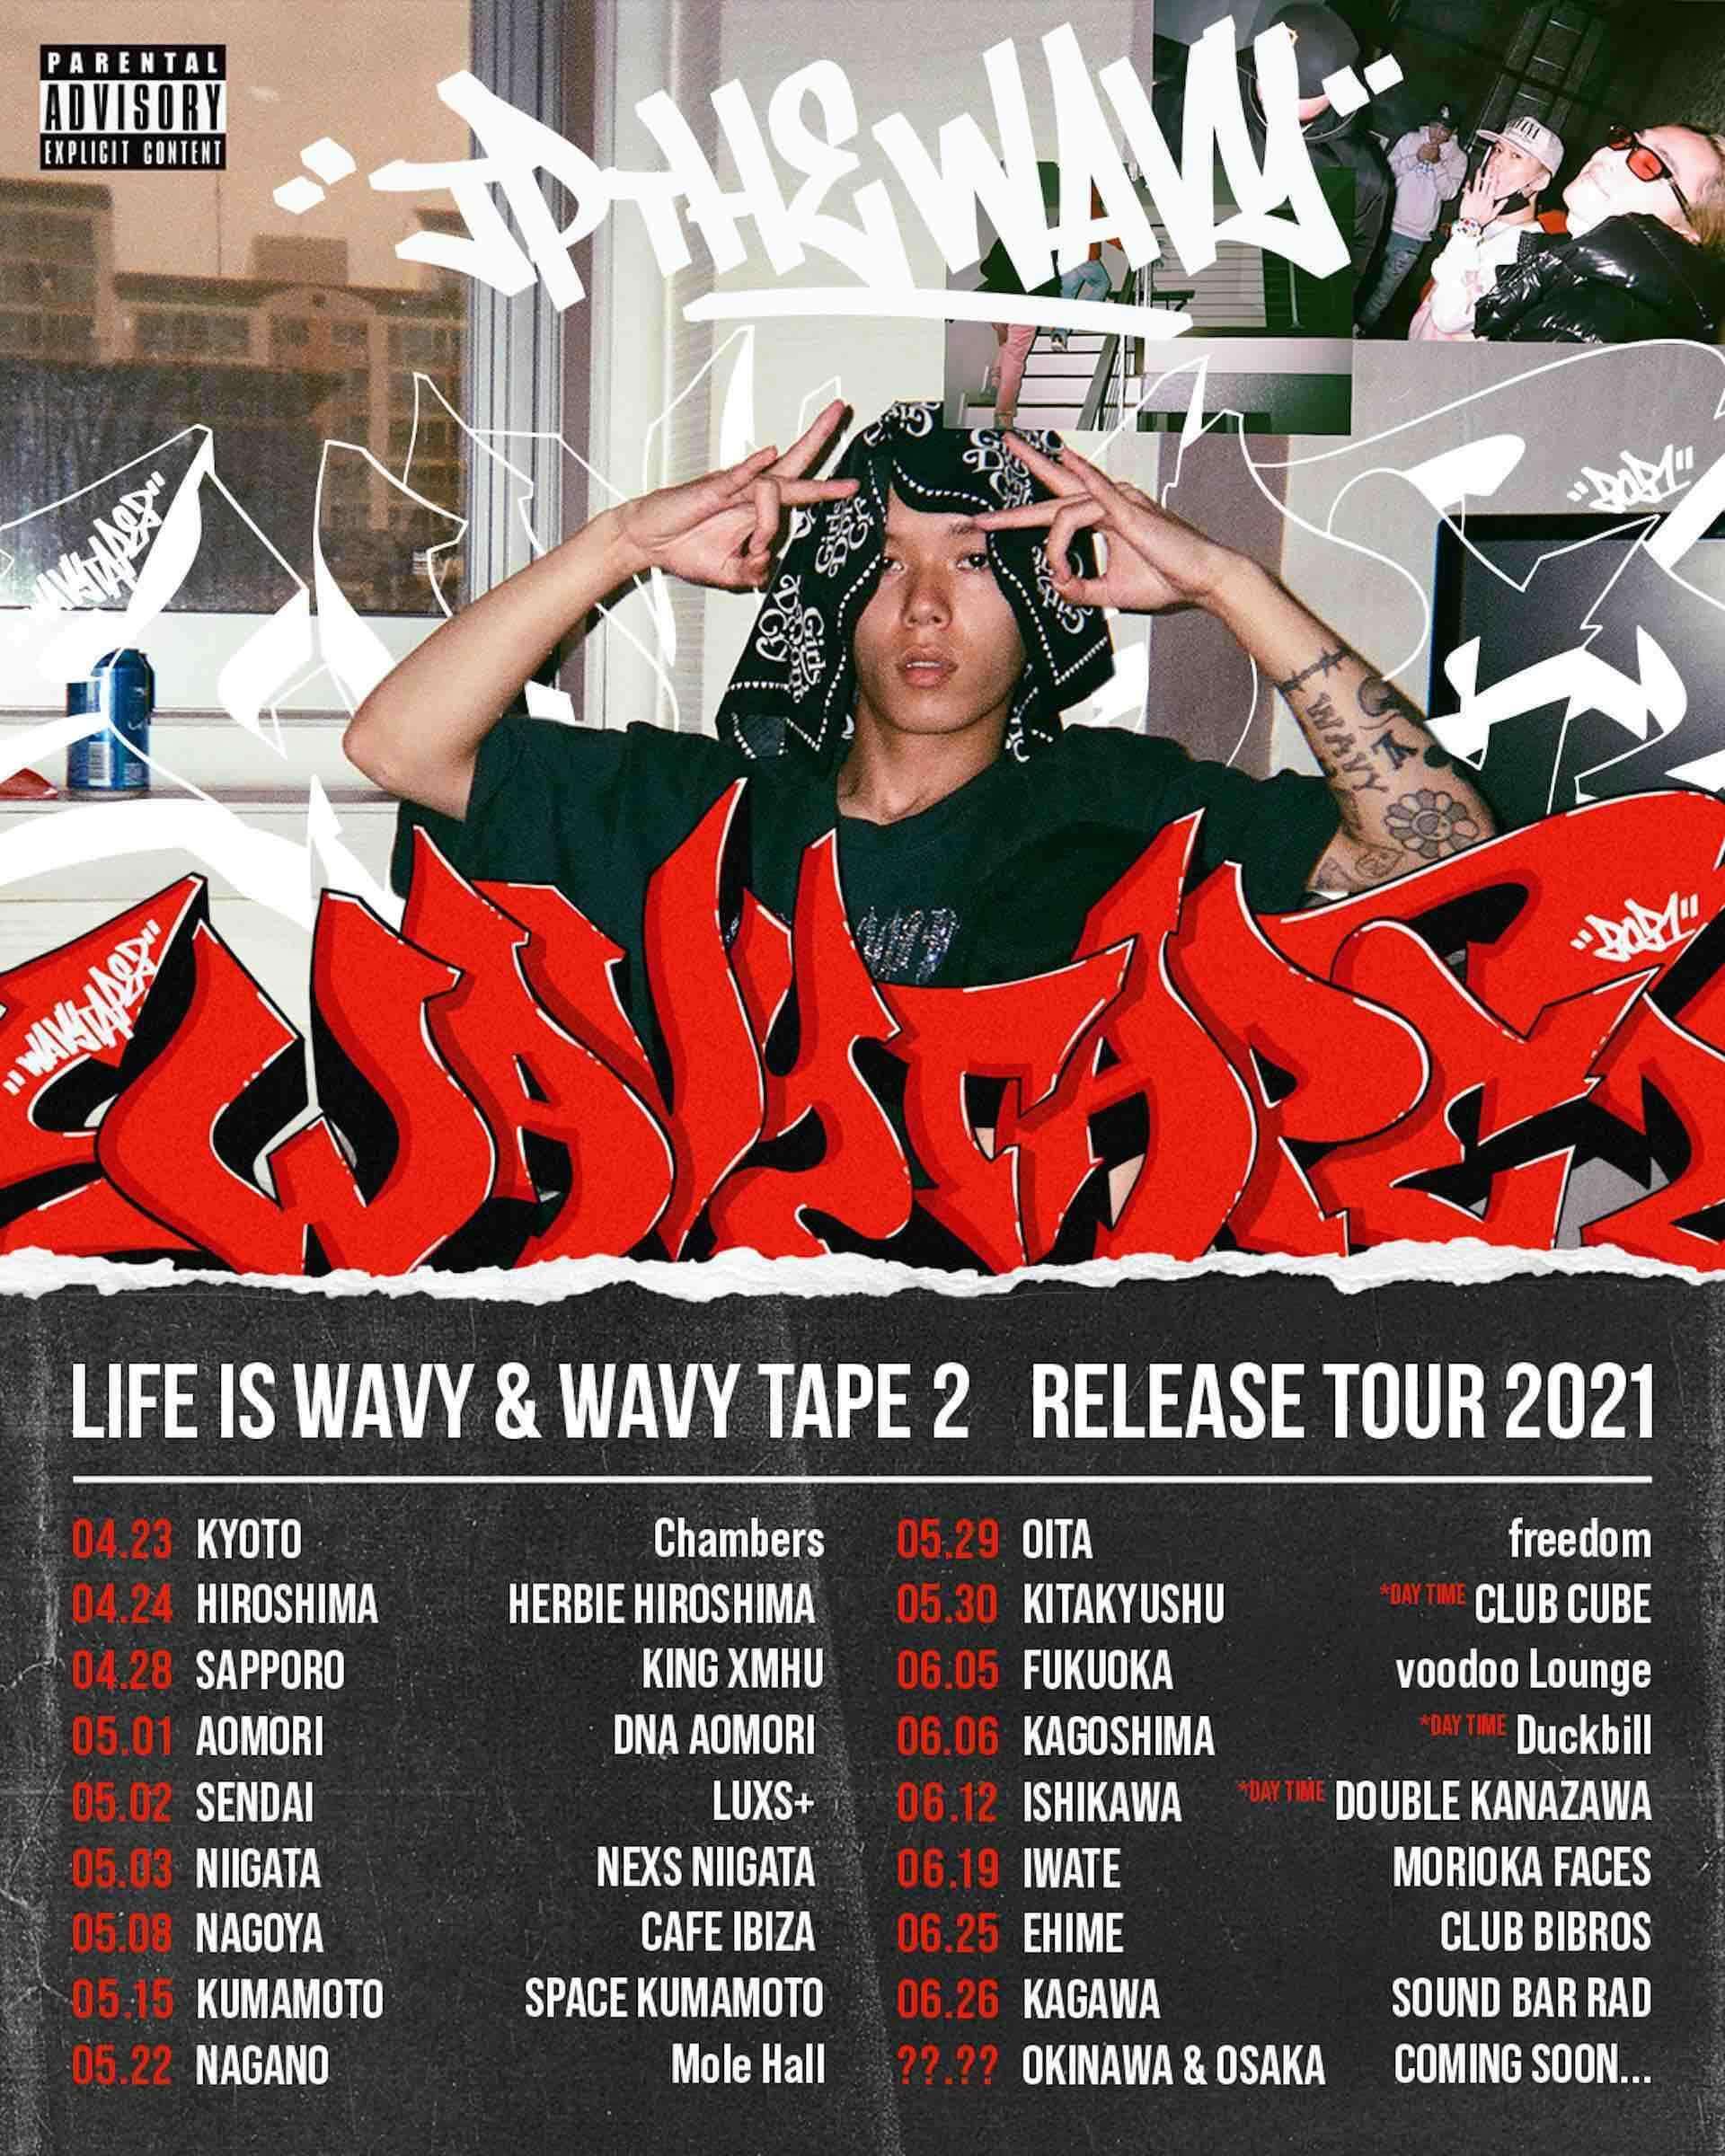 JP THE WAVYがLEX、vividboooyらを迎えた最新EP『WAVY TAPE 2』をリリース!クラブツアーも開催決定 music210331_jpthewavy_3-1920x2400